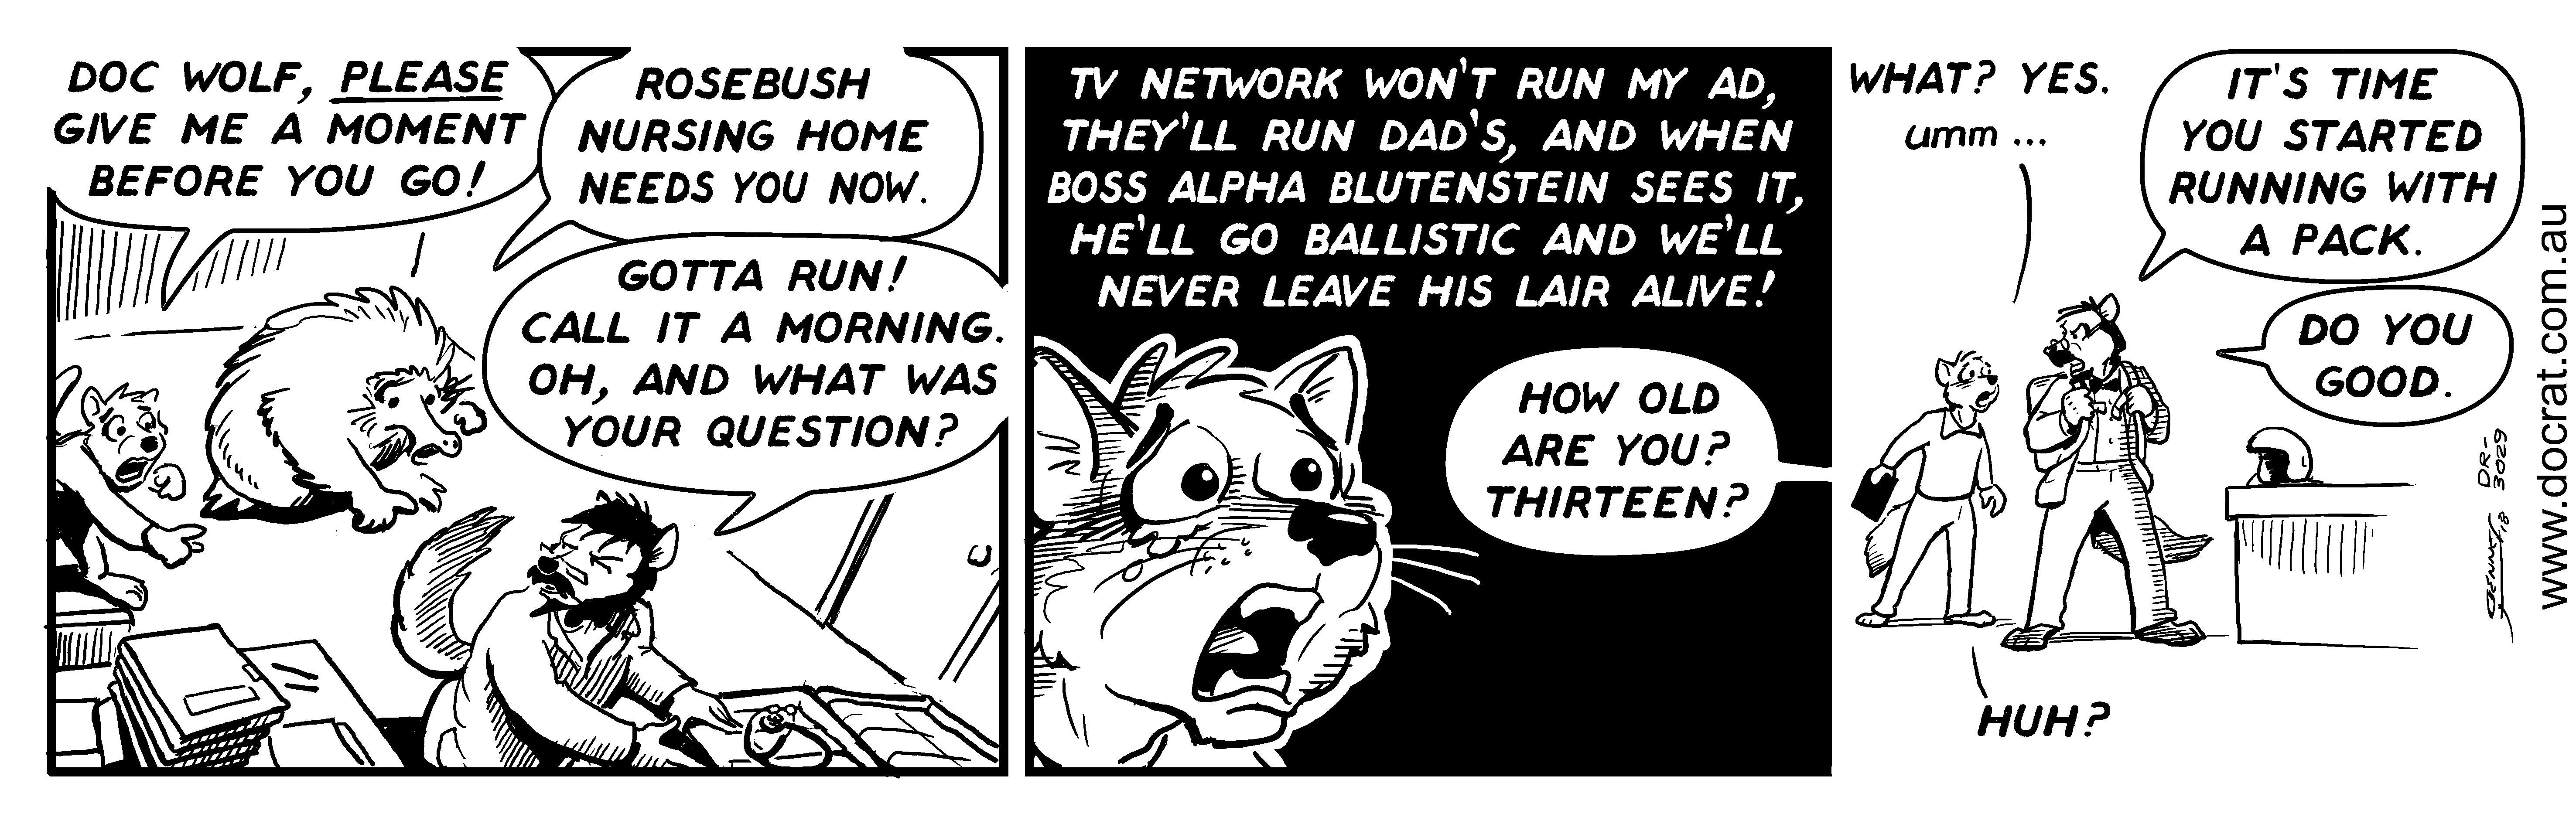 20180524